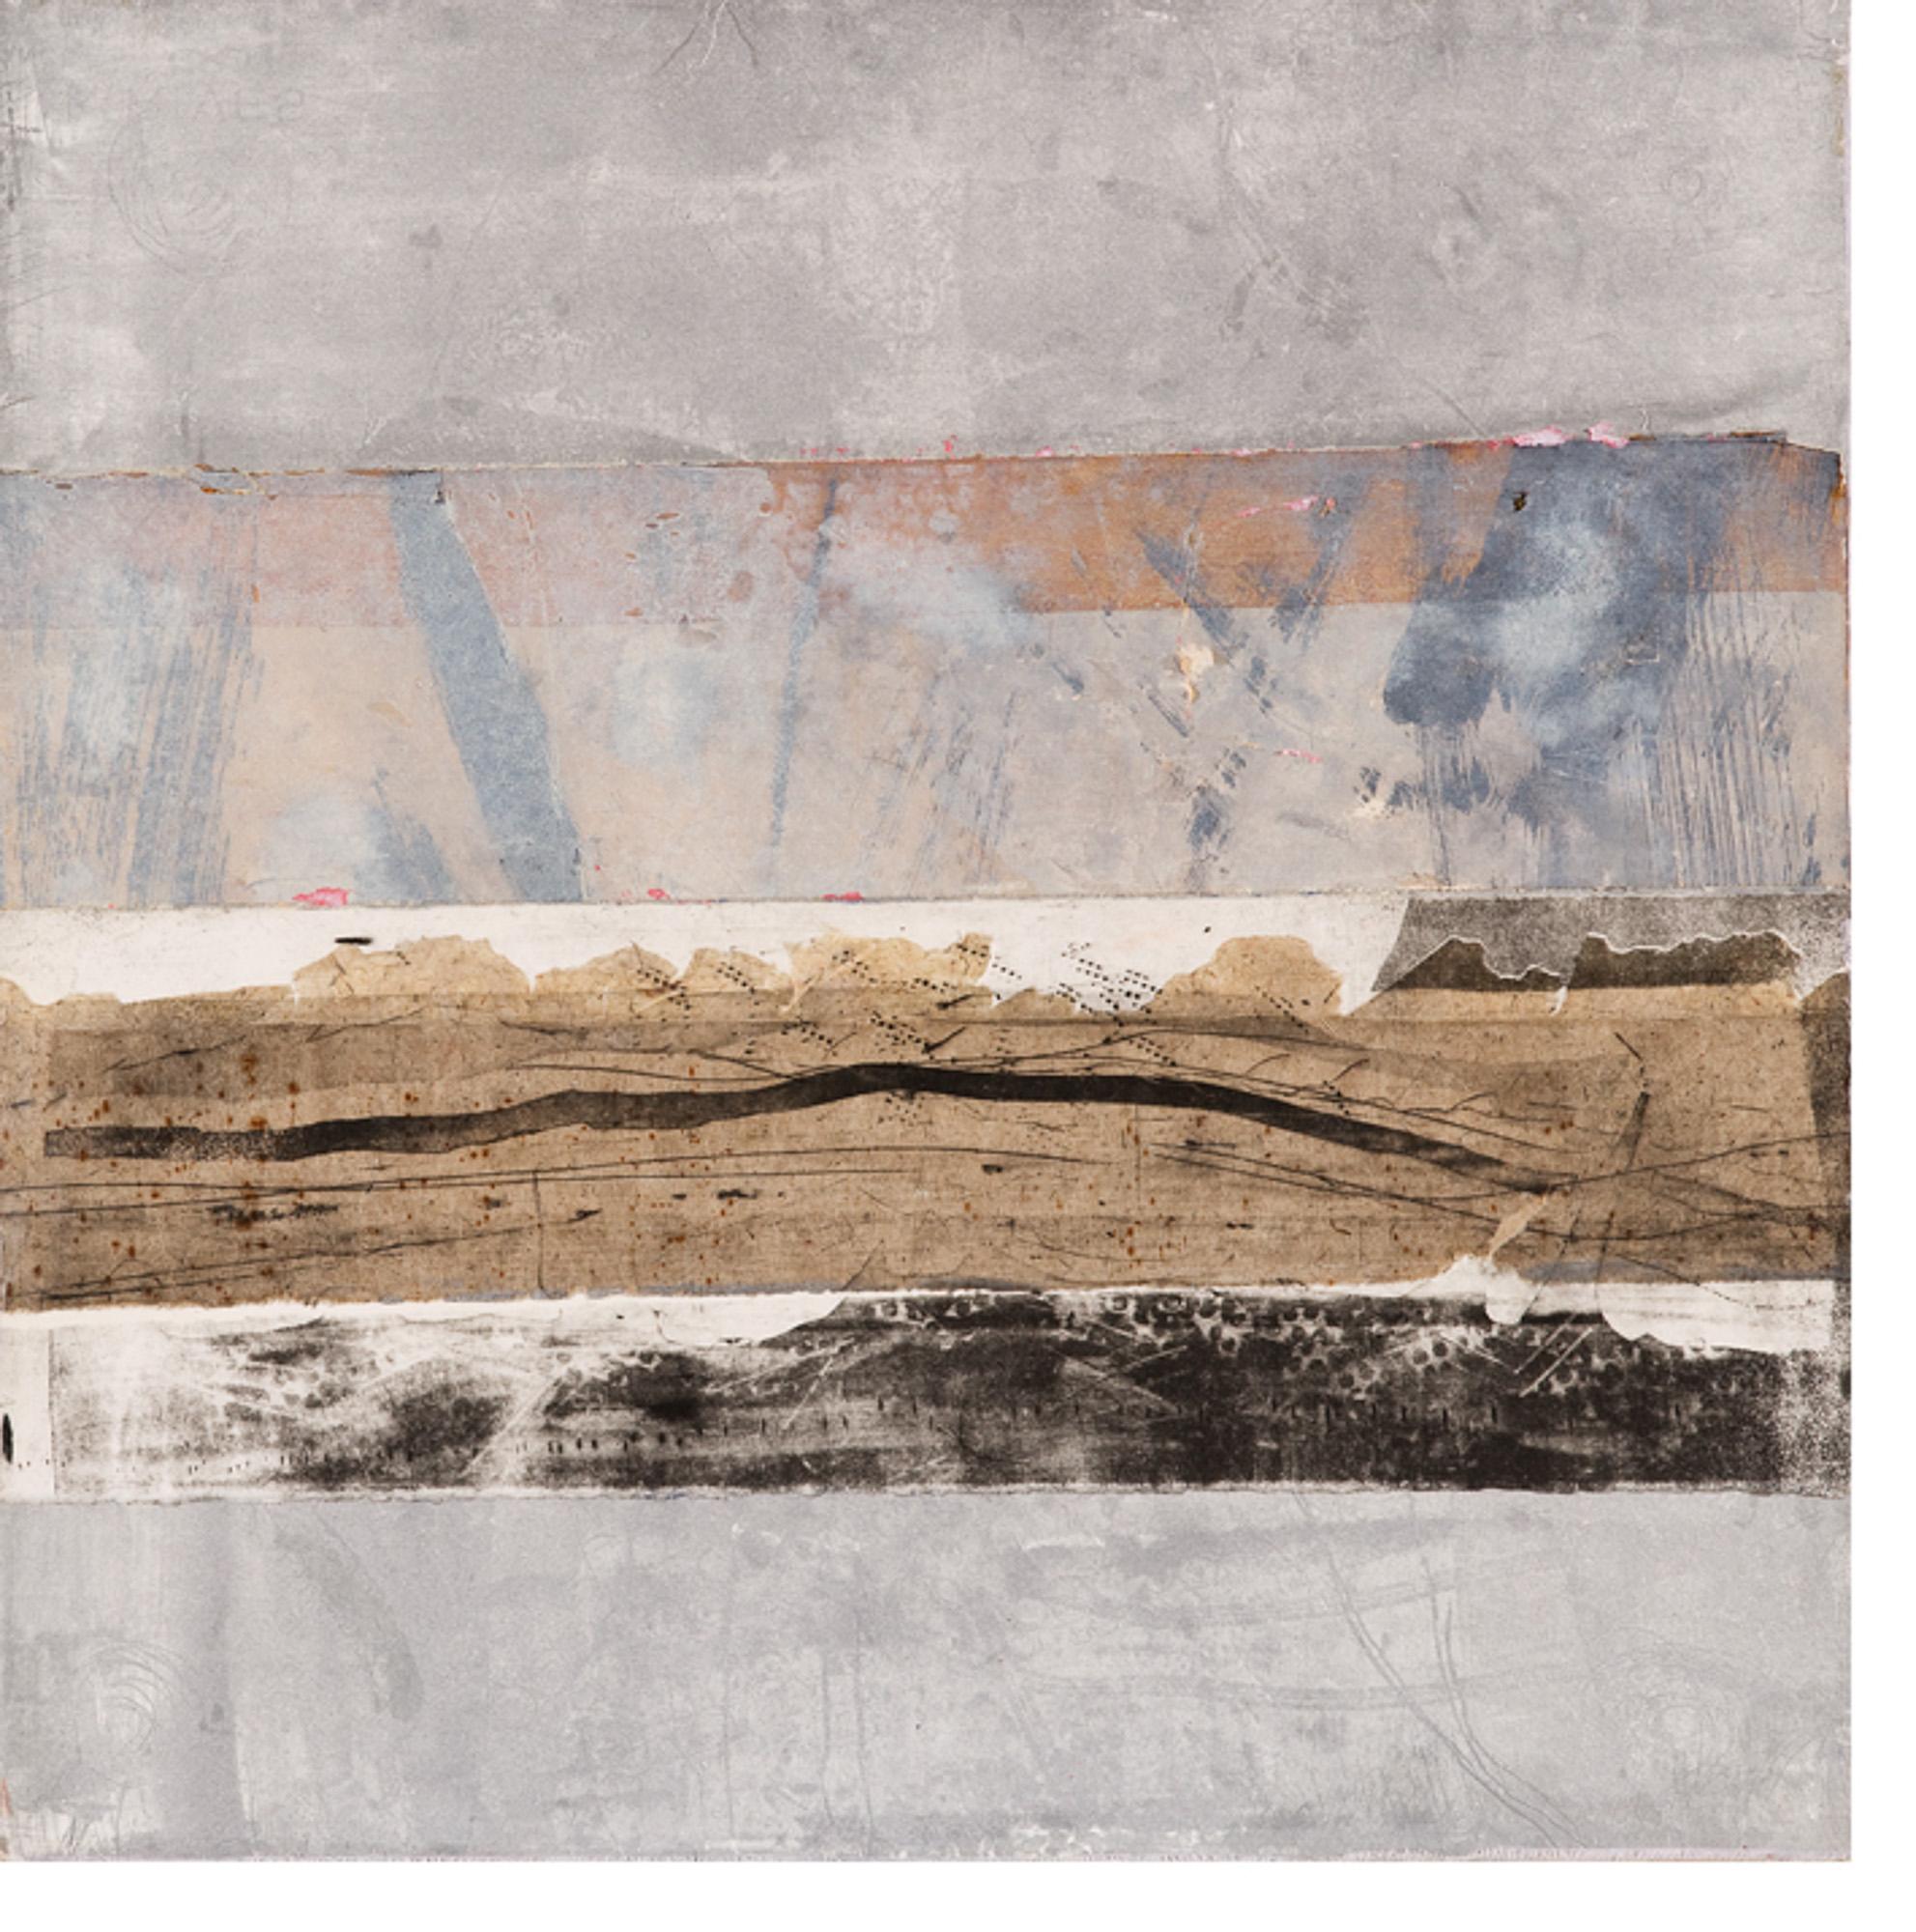 Emporda, 2010, 50x50cm